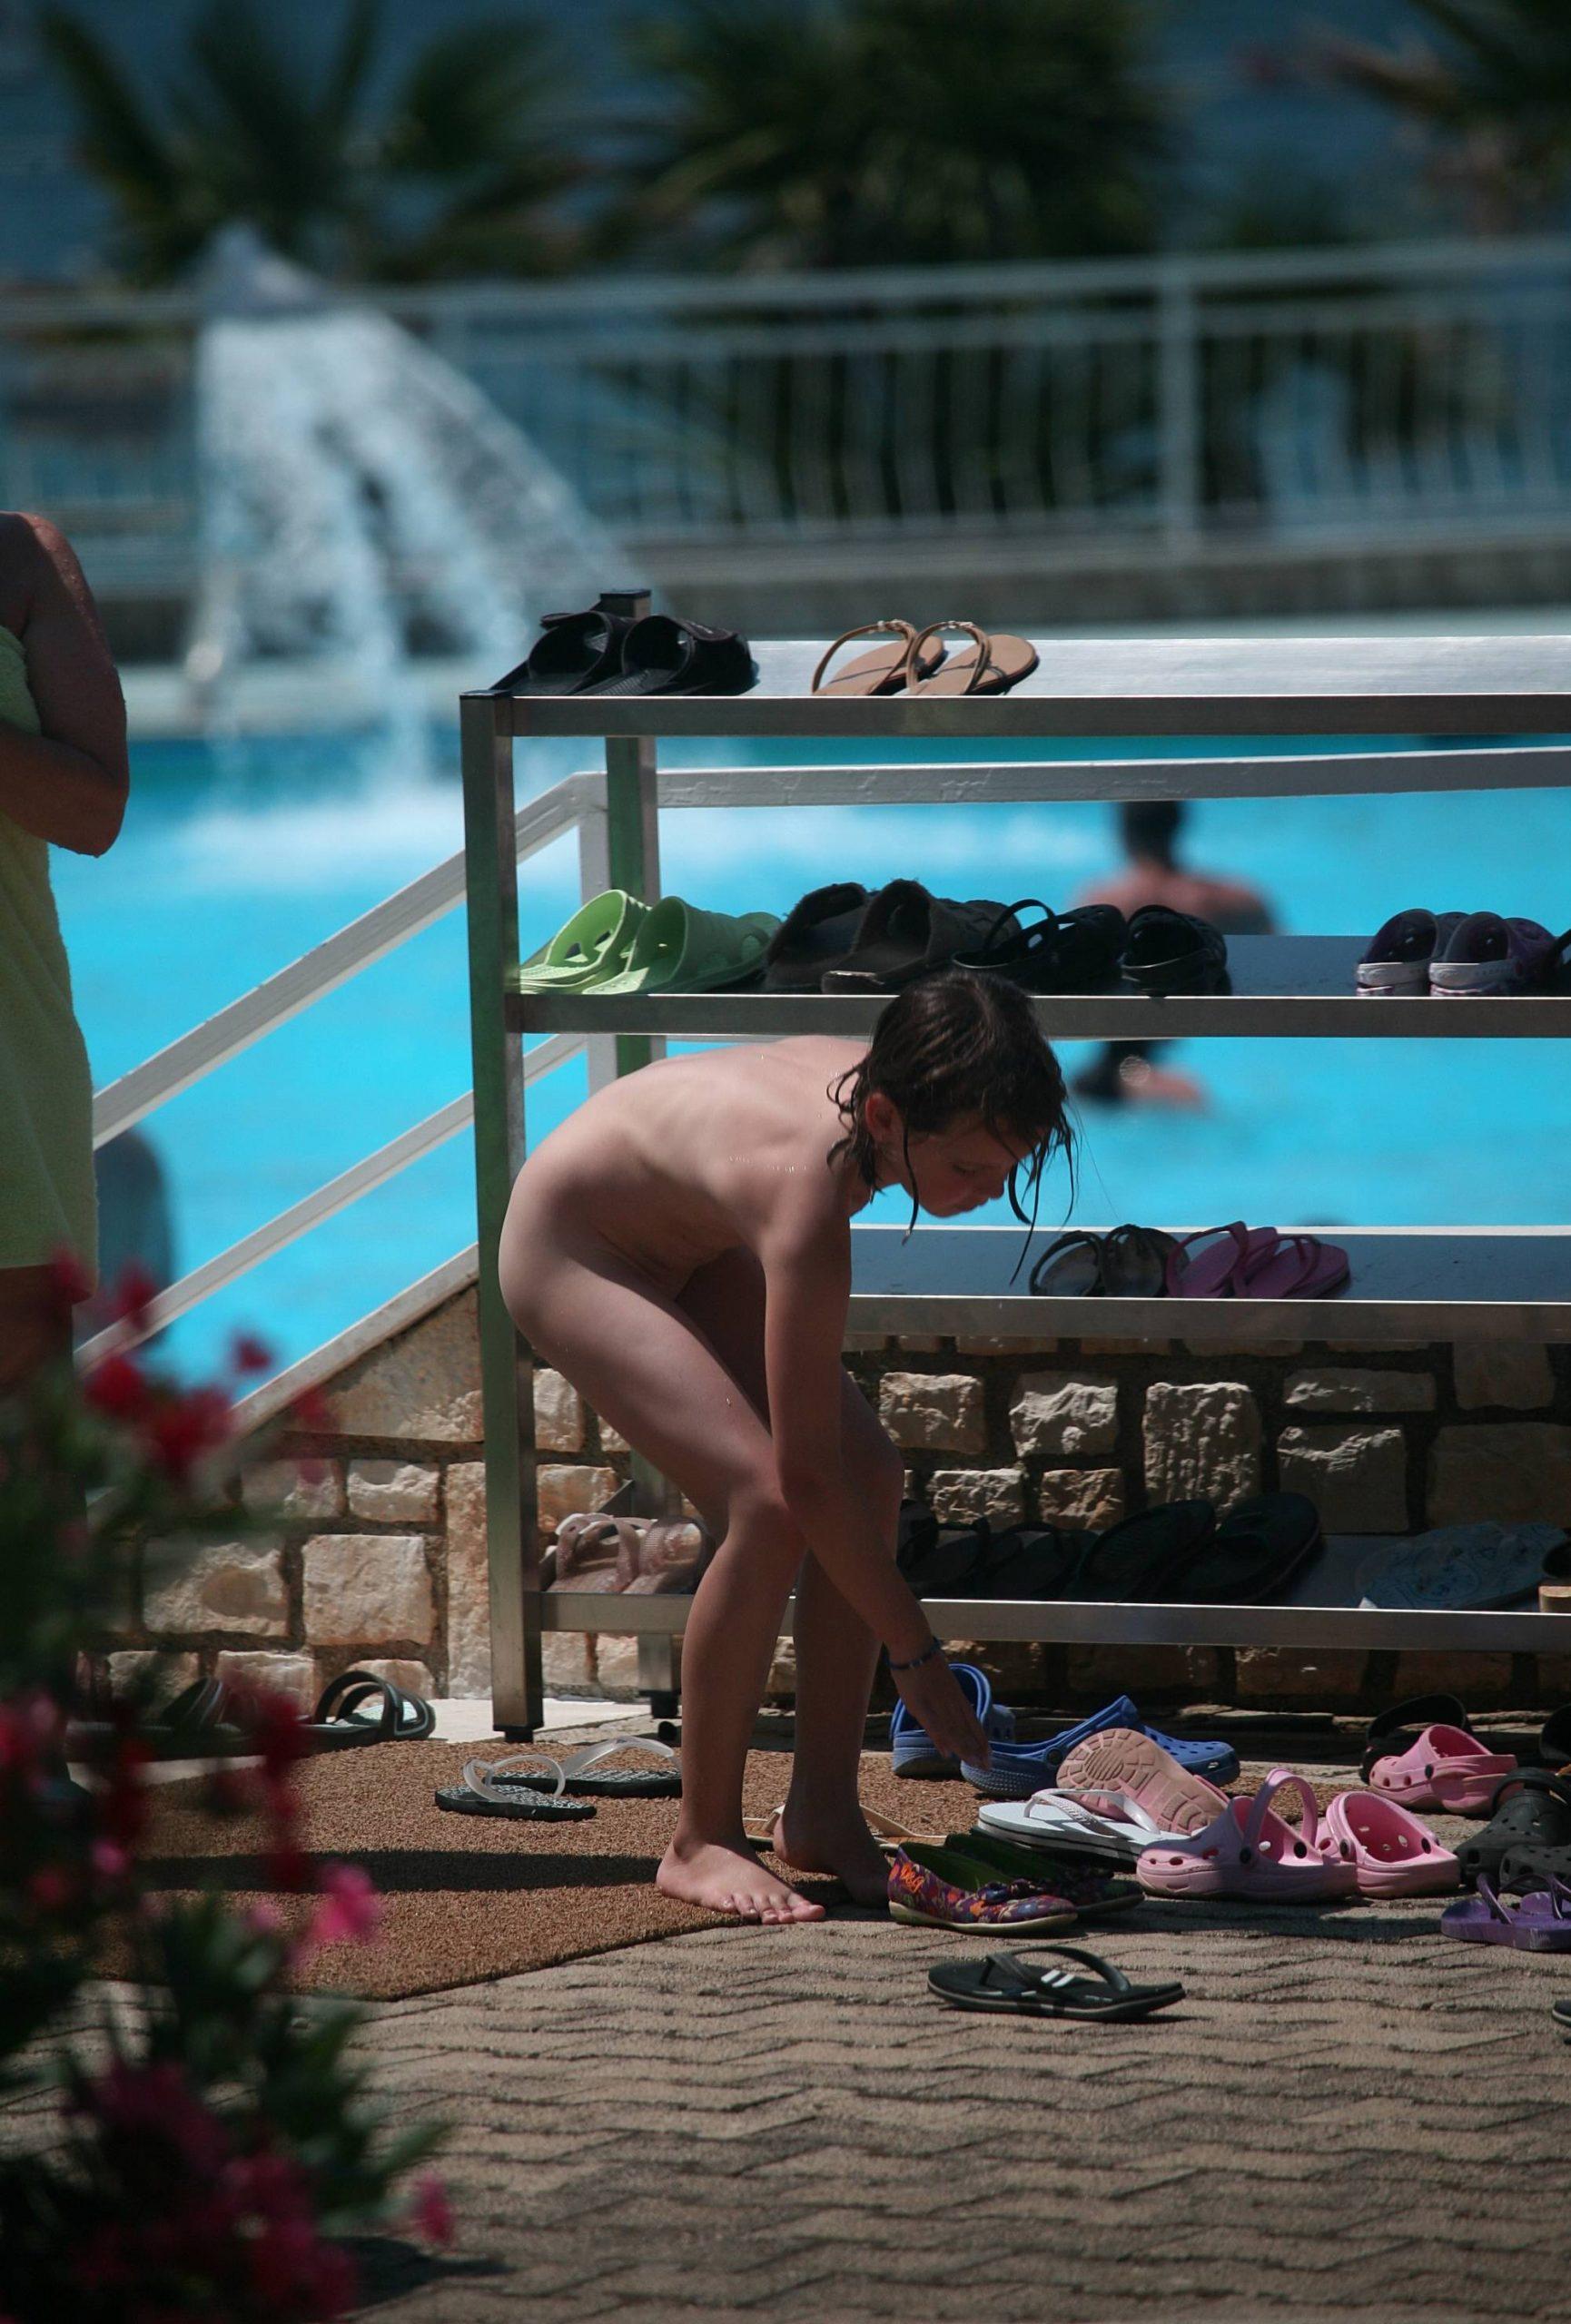 Pure Nudism-Nudist Park Child Passing - 3